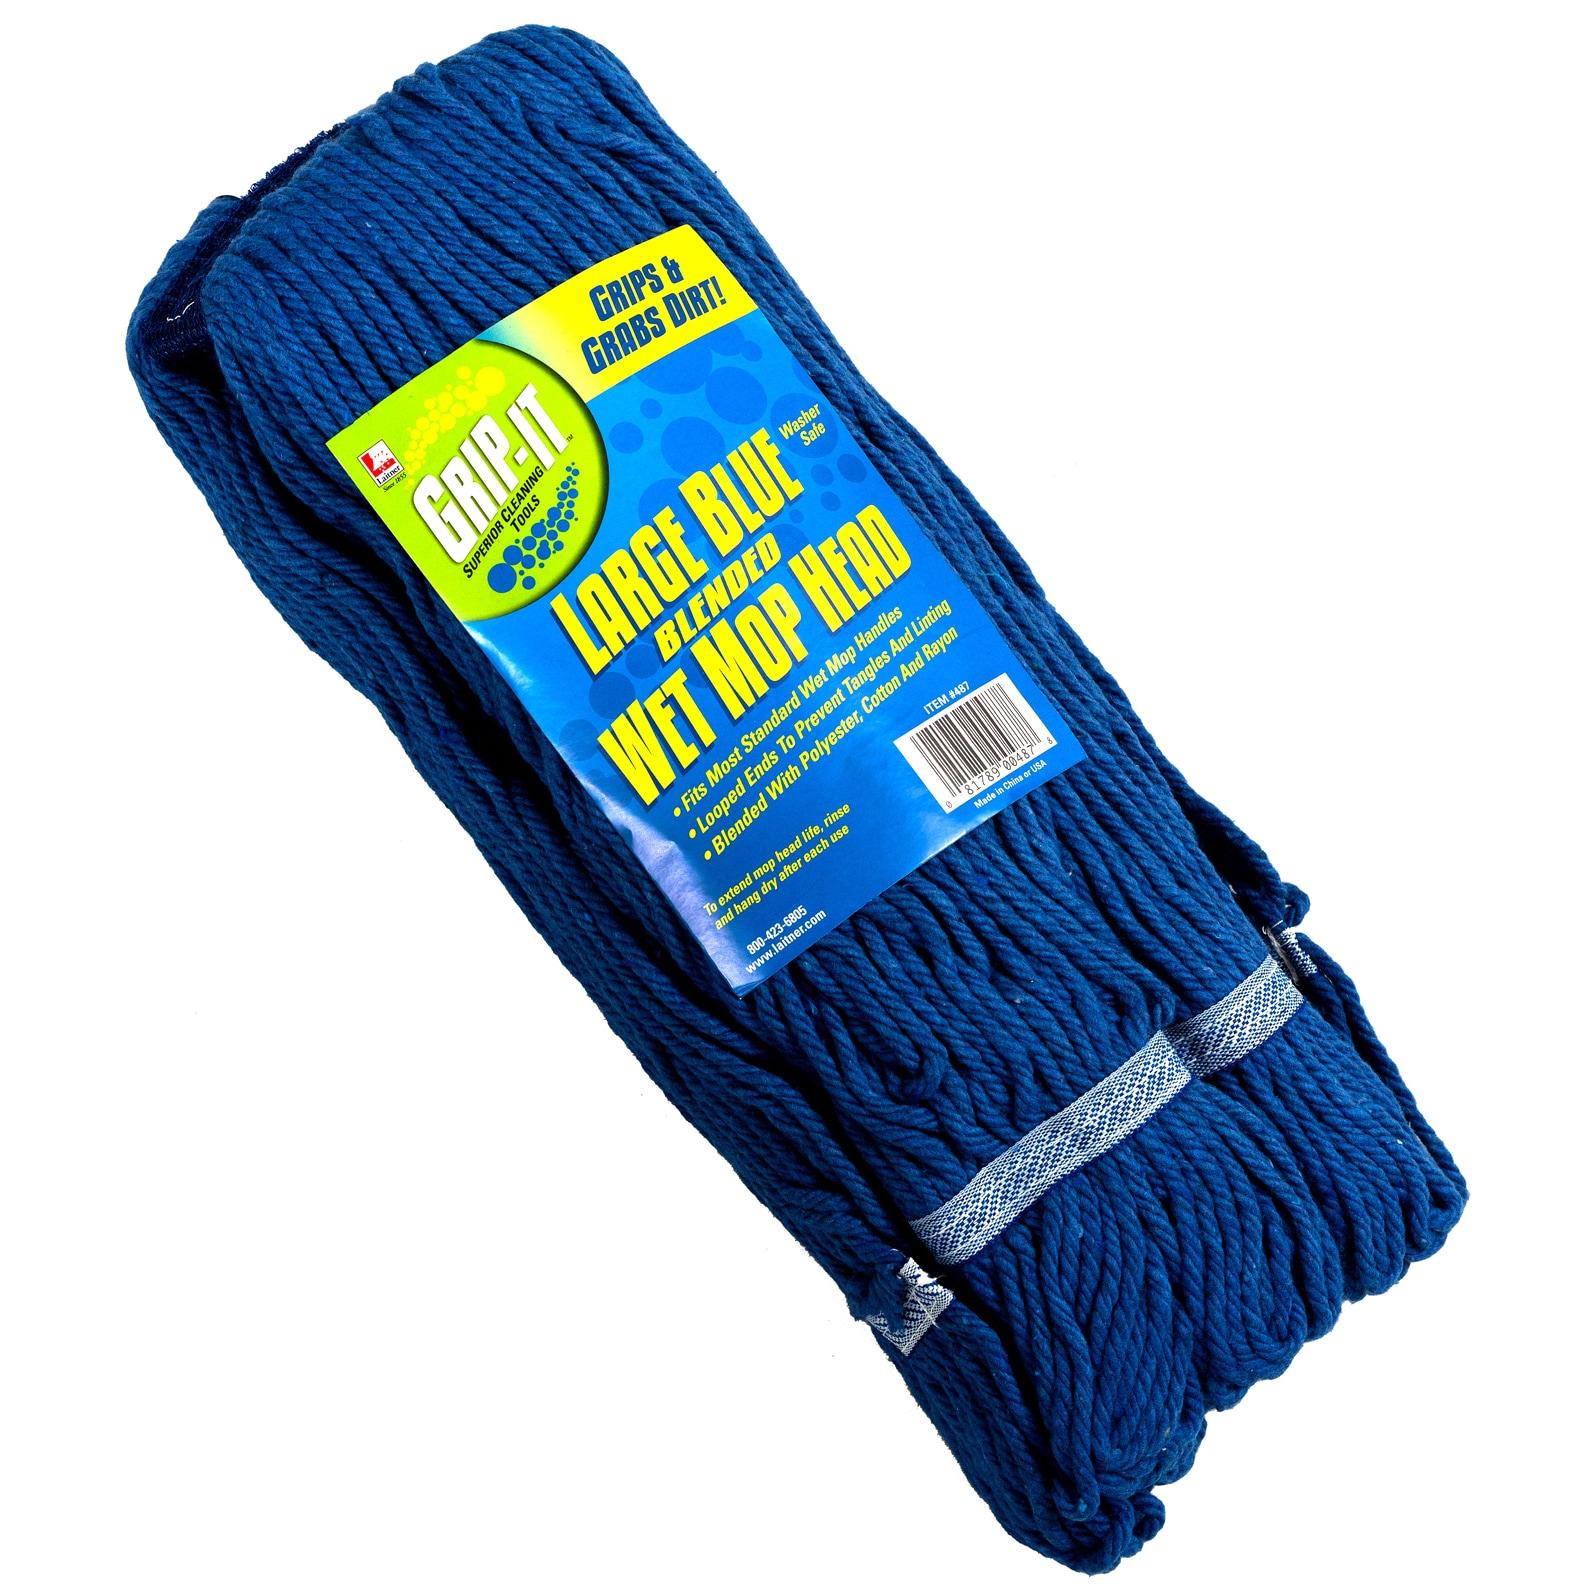 Laitner Brush Company 487 4 Ply Large Blue Looped Mop Head (Mop Head Lg Blublend)